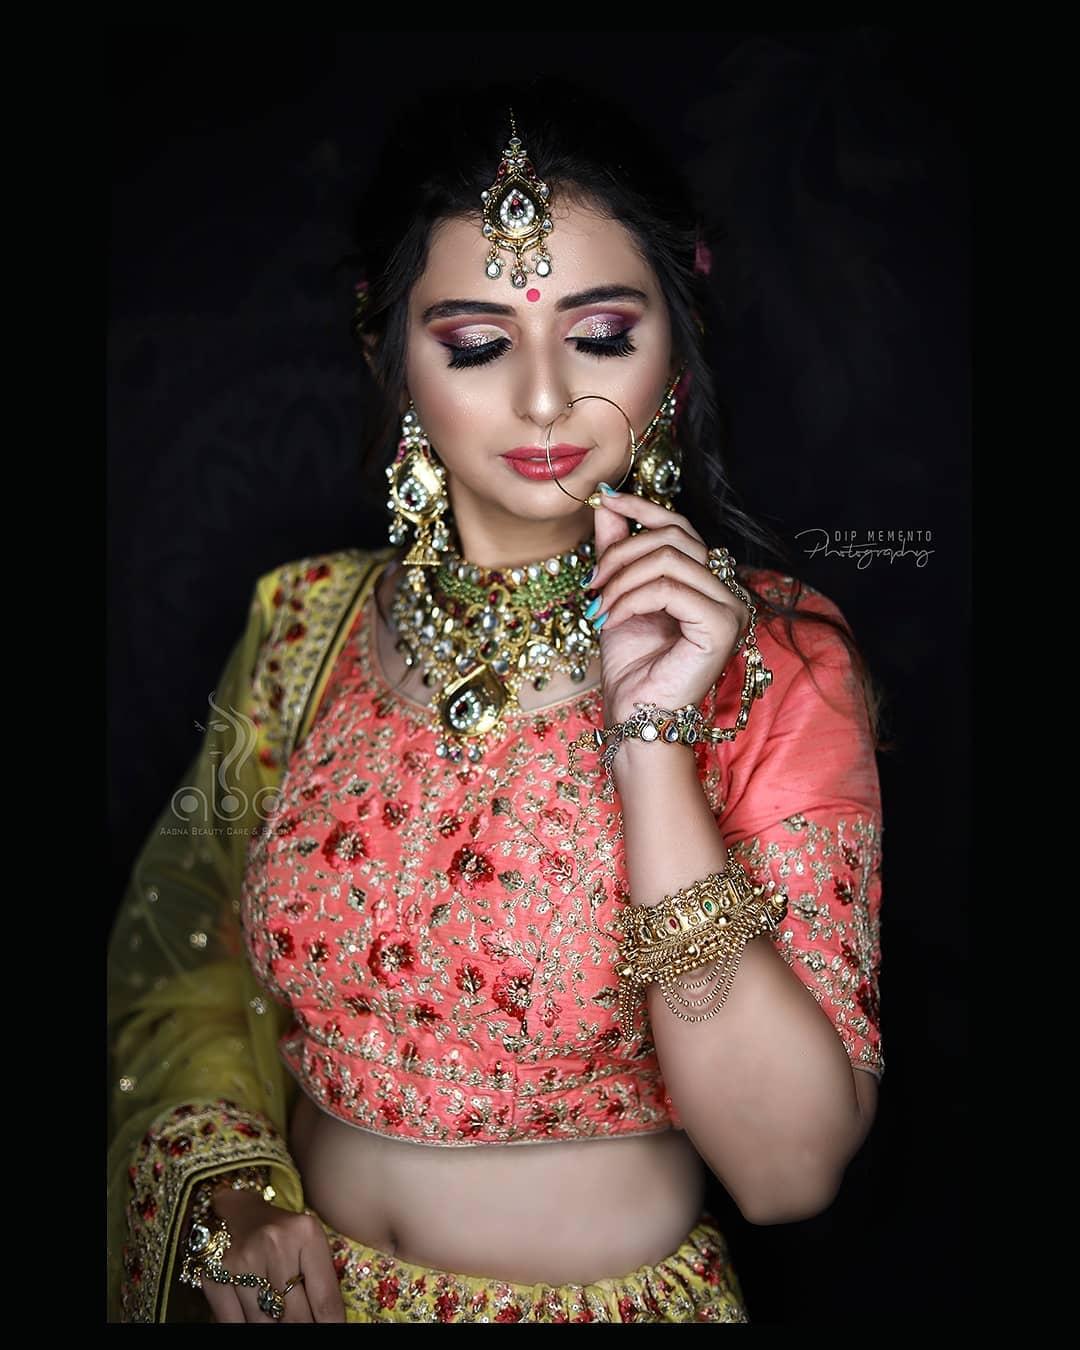 Dip Memento Photography,  beautiful#bride#PHOTOGRAPHY, dipmementophotography, beauty#9924227745#bridetobe#bridesofindia#bridehairstyle#bridestyle#bridestory#bridesessentials#brideinspo#brideinspiration#wedding#weddingphotography#weddingdress#weddinginspiration#weddingideas#weddingphotographer#weddingplanner#weddingdiaries#weddingbrigade#indiagram#indianwedding#photography#photooftheday#photoshoot#photographers_of_india